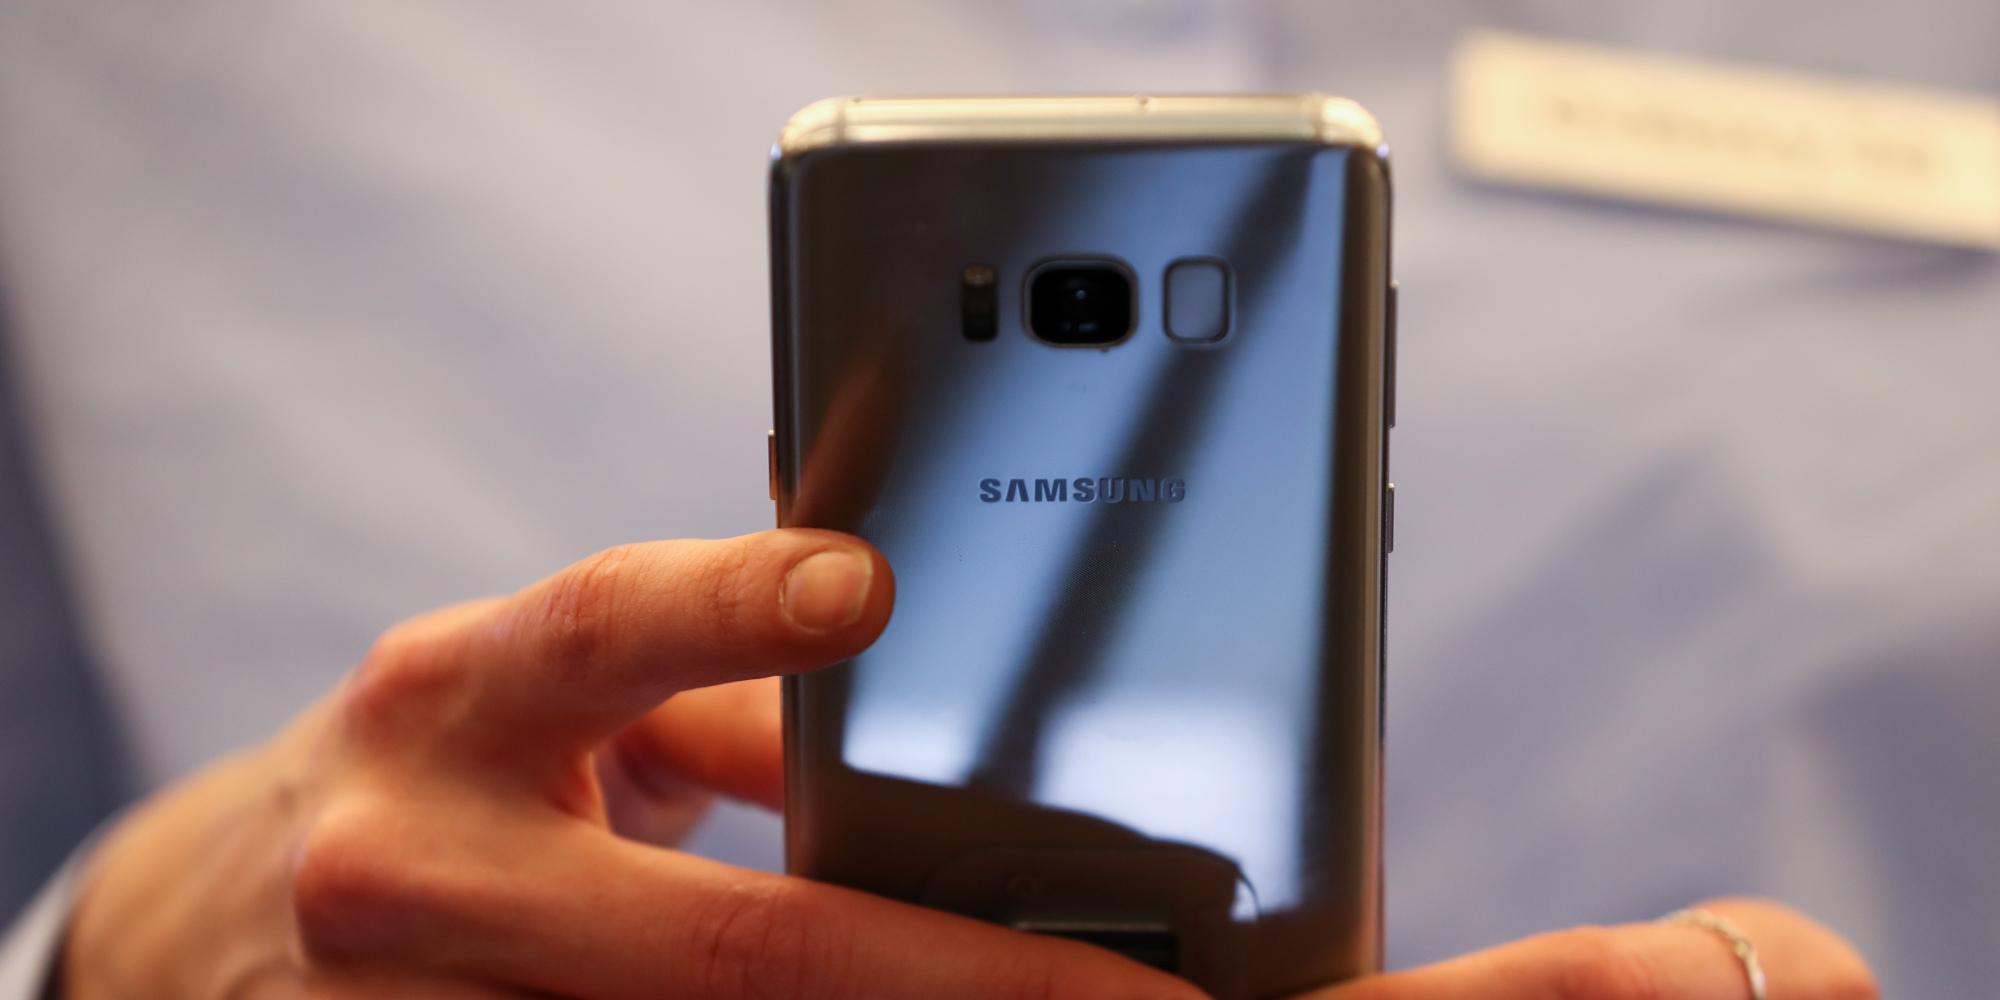 غالاكسي Note 8 سيكون أغلى هواتف سامسونغ.. كم يبلغ ثمنه؟